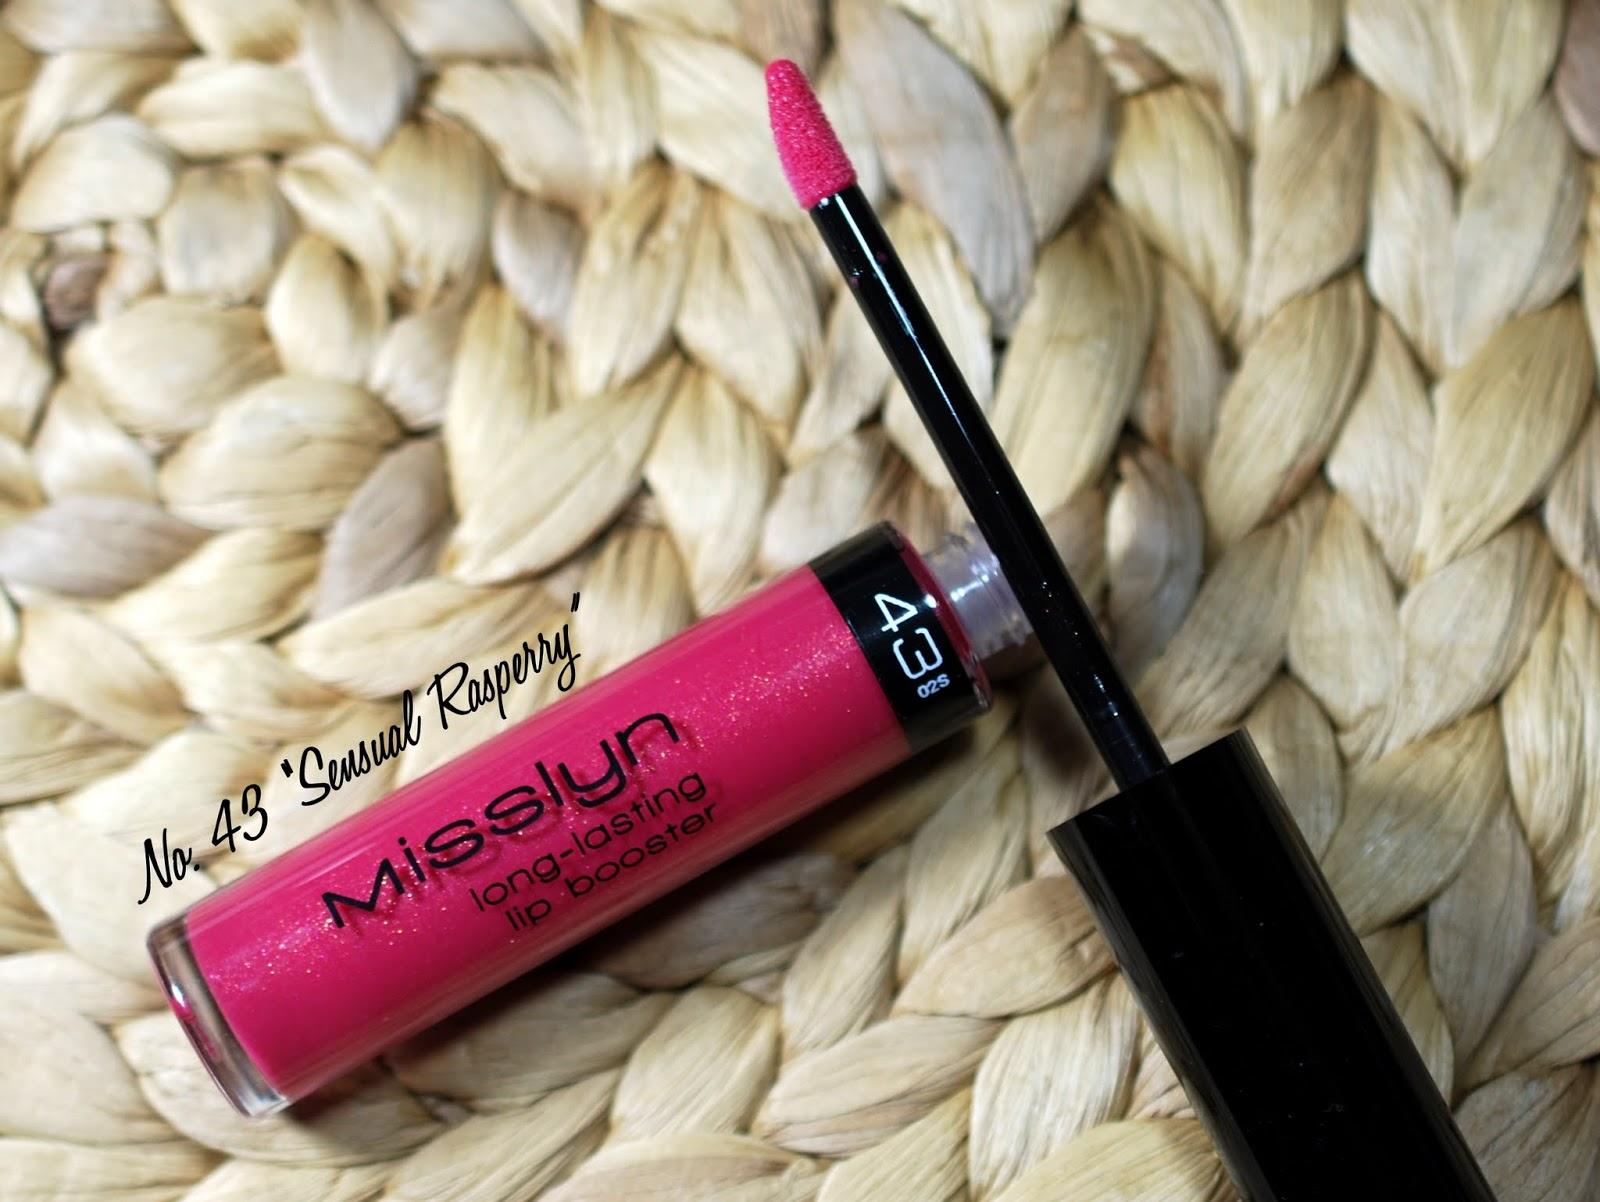 Misslyn Long-Lasting Lip Bosster Nr. 43 Sensual Raspberry